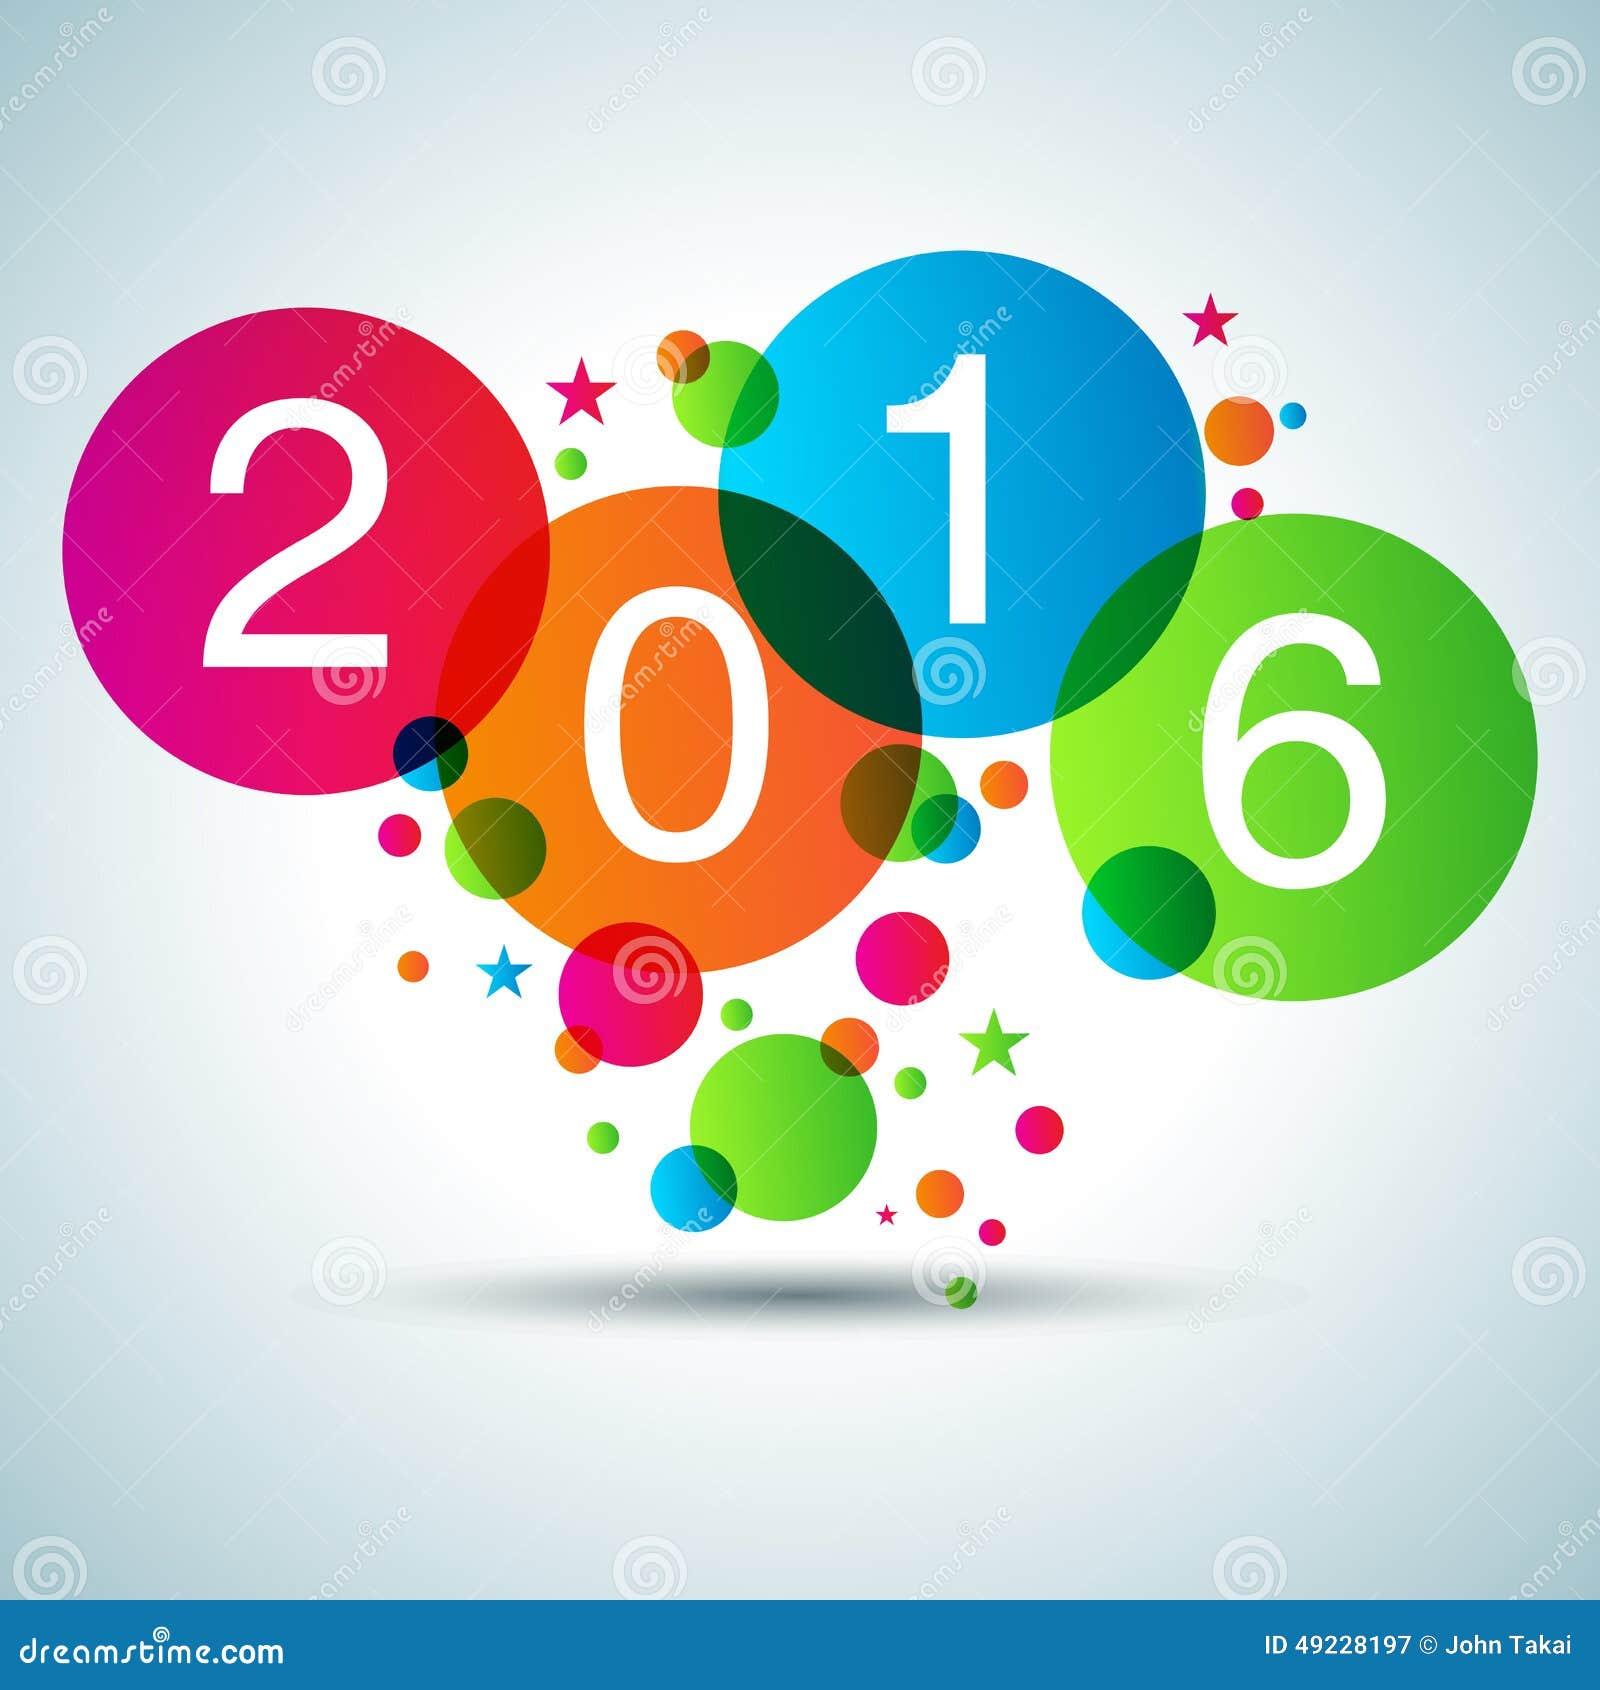 Happy New Year 2016 Stock Vector - Image: 49228197